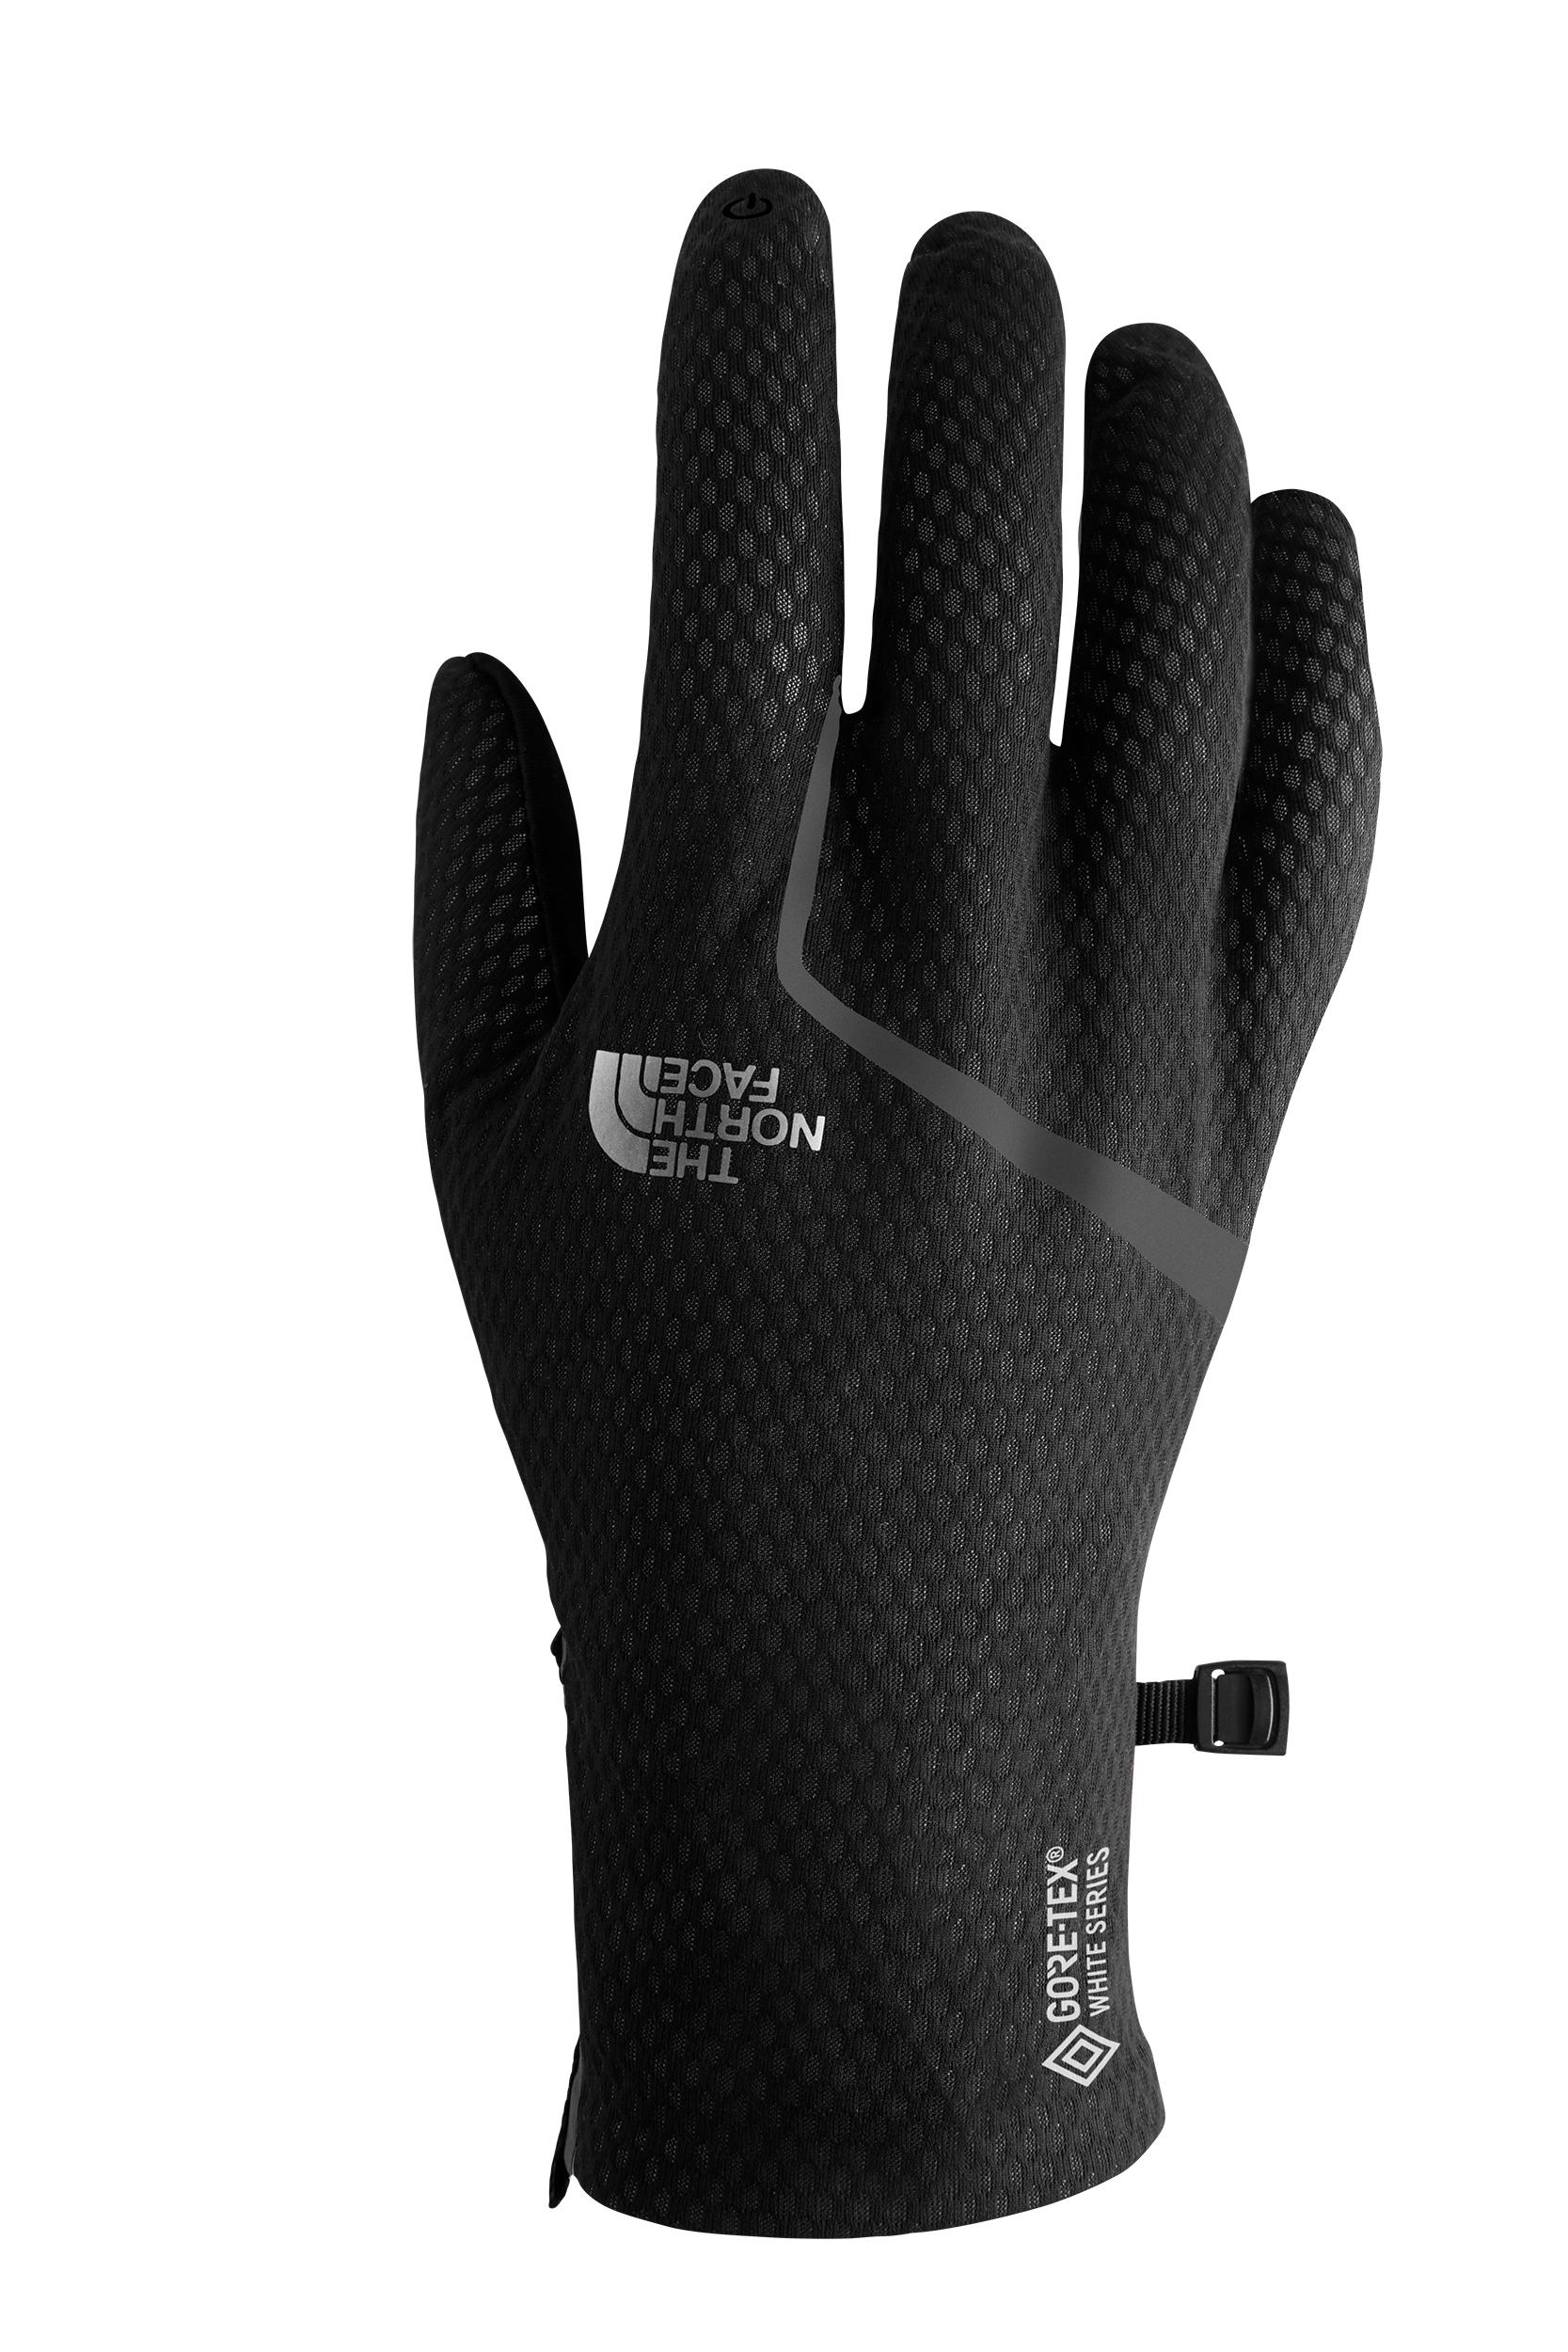 d3b1abe48 The North Face Gore CloseFit Tricot Gloves - Men's | MEC